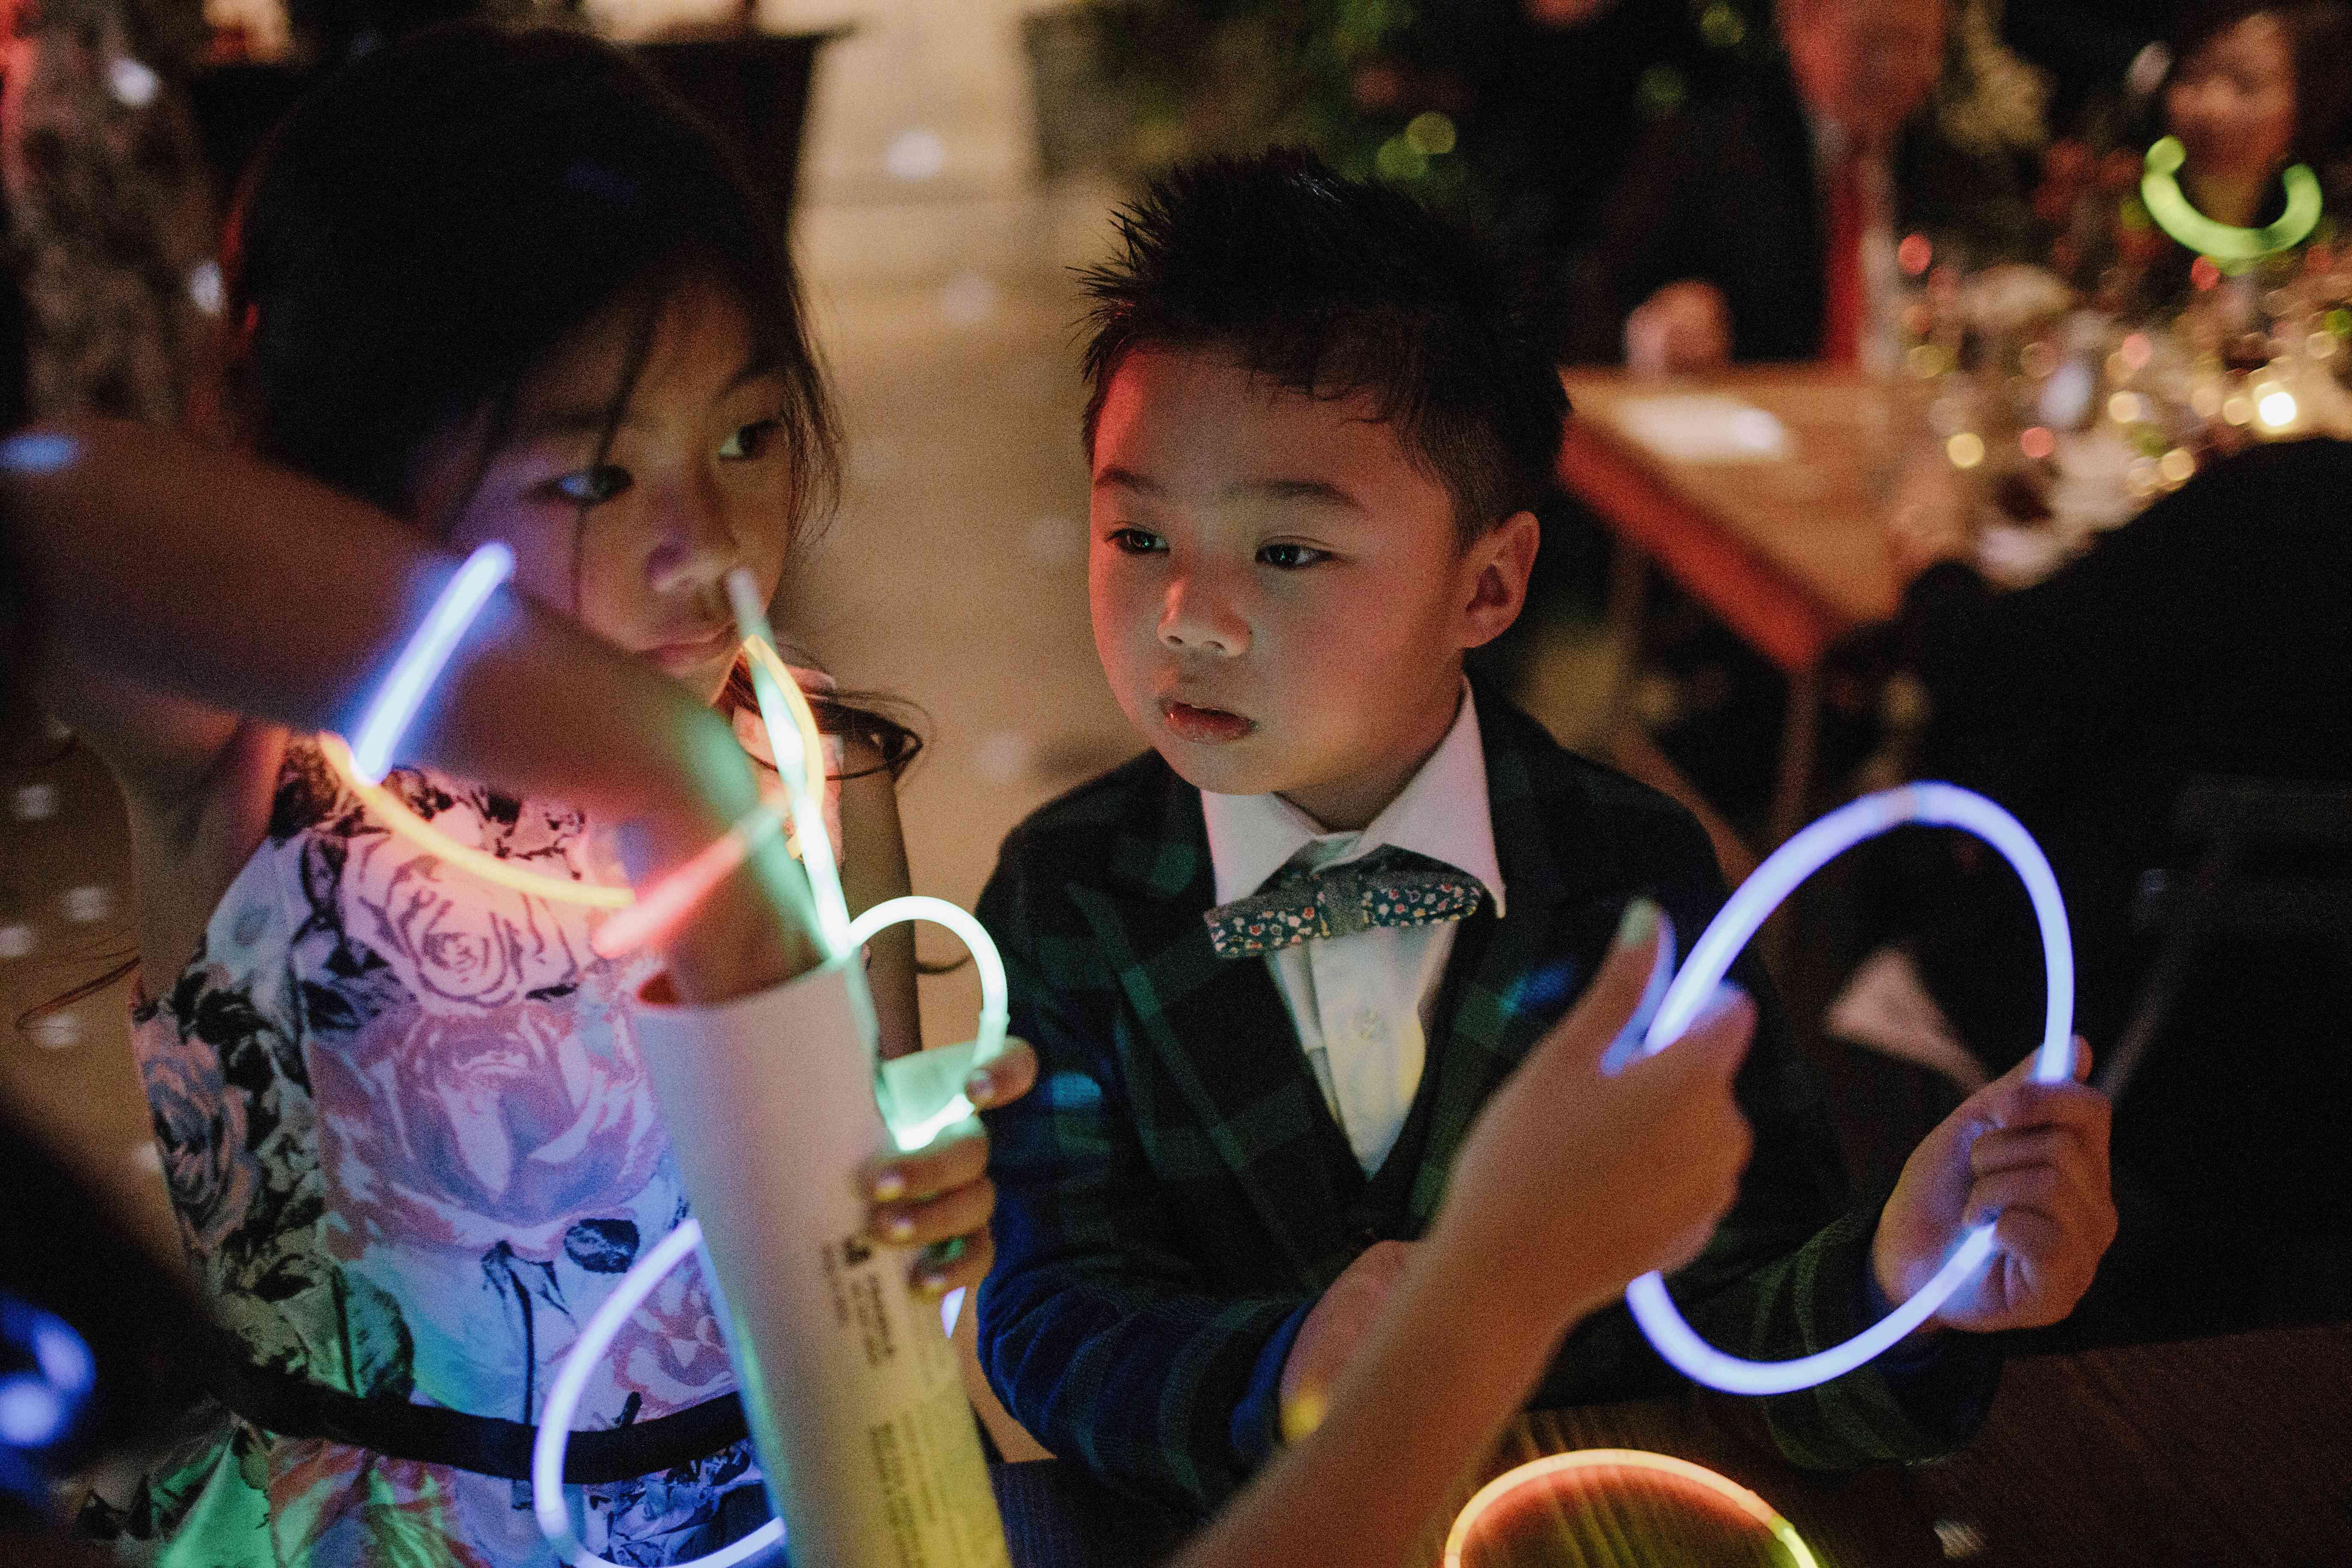 <p>Kids with glowsticks</p><br><br>